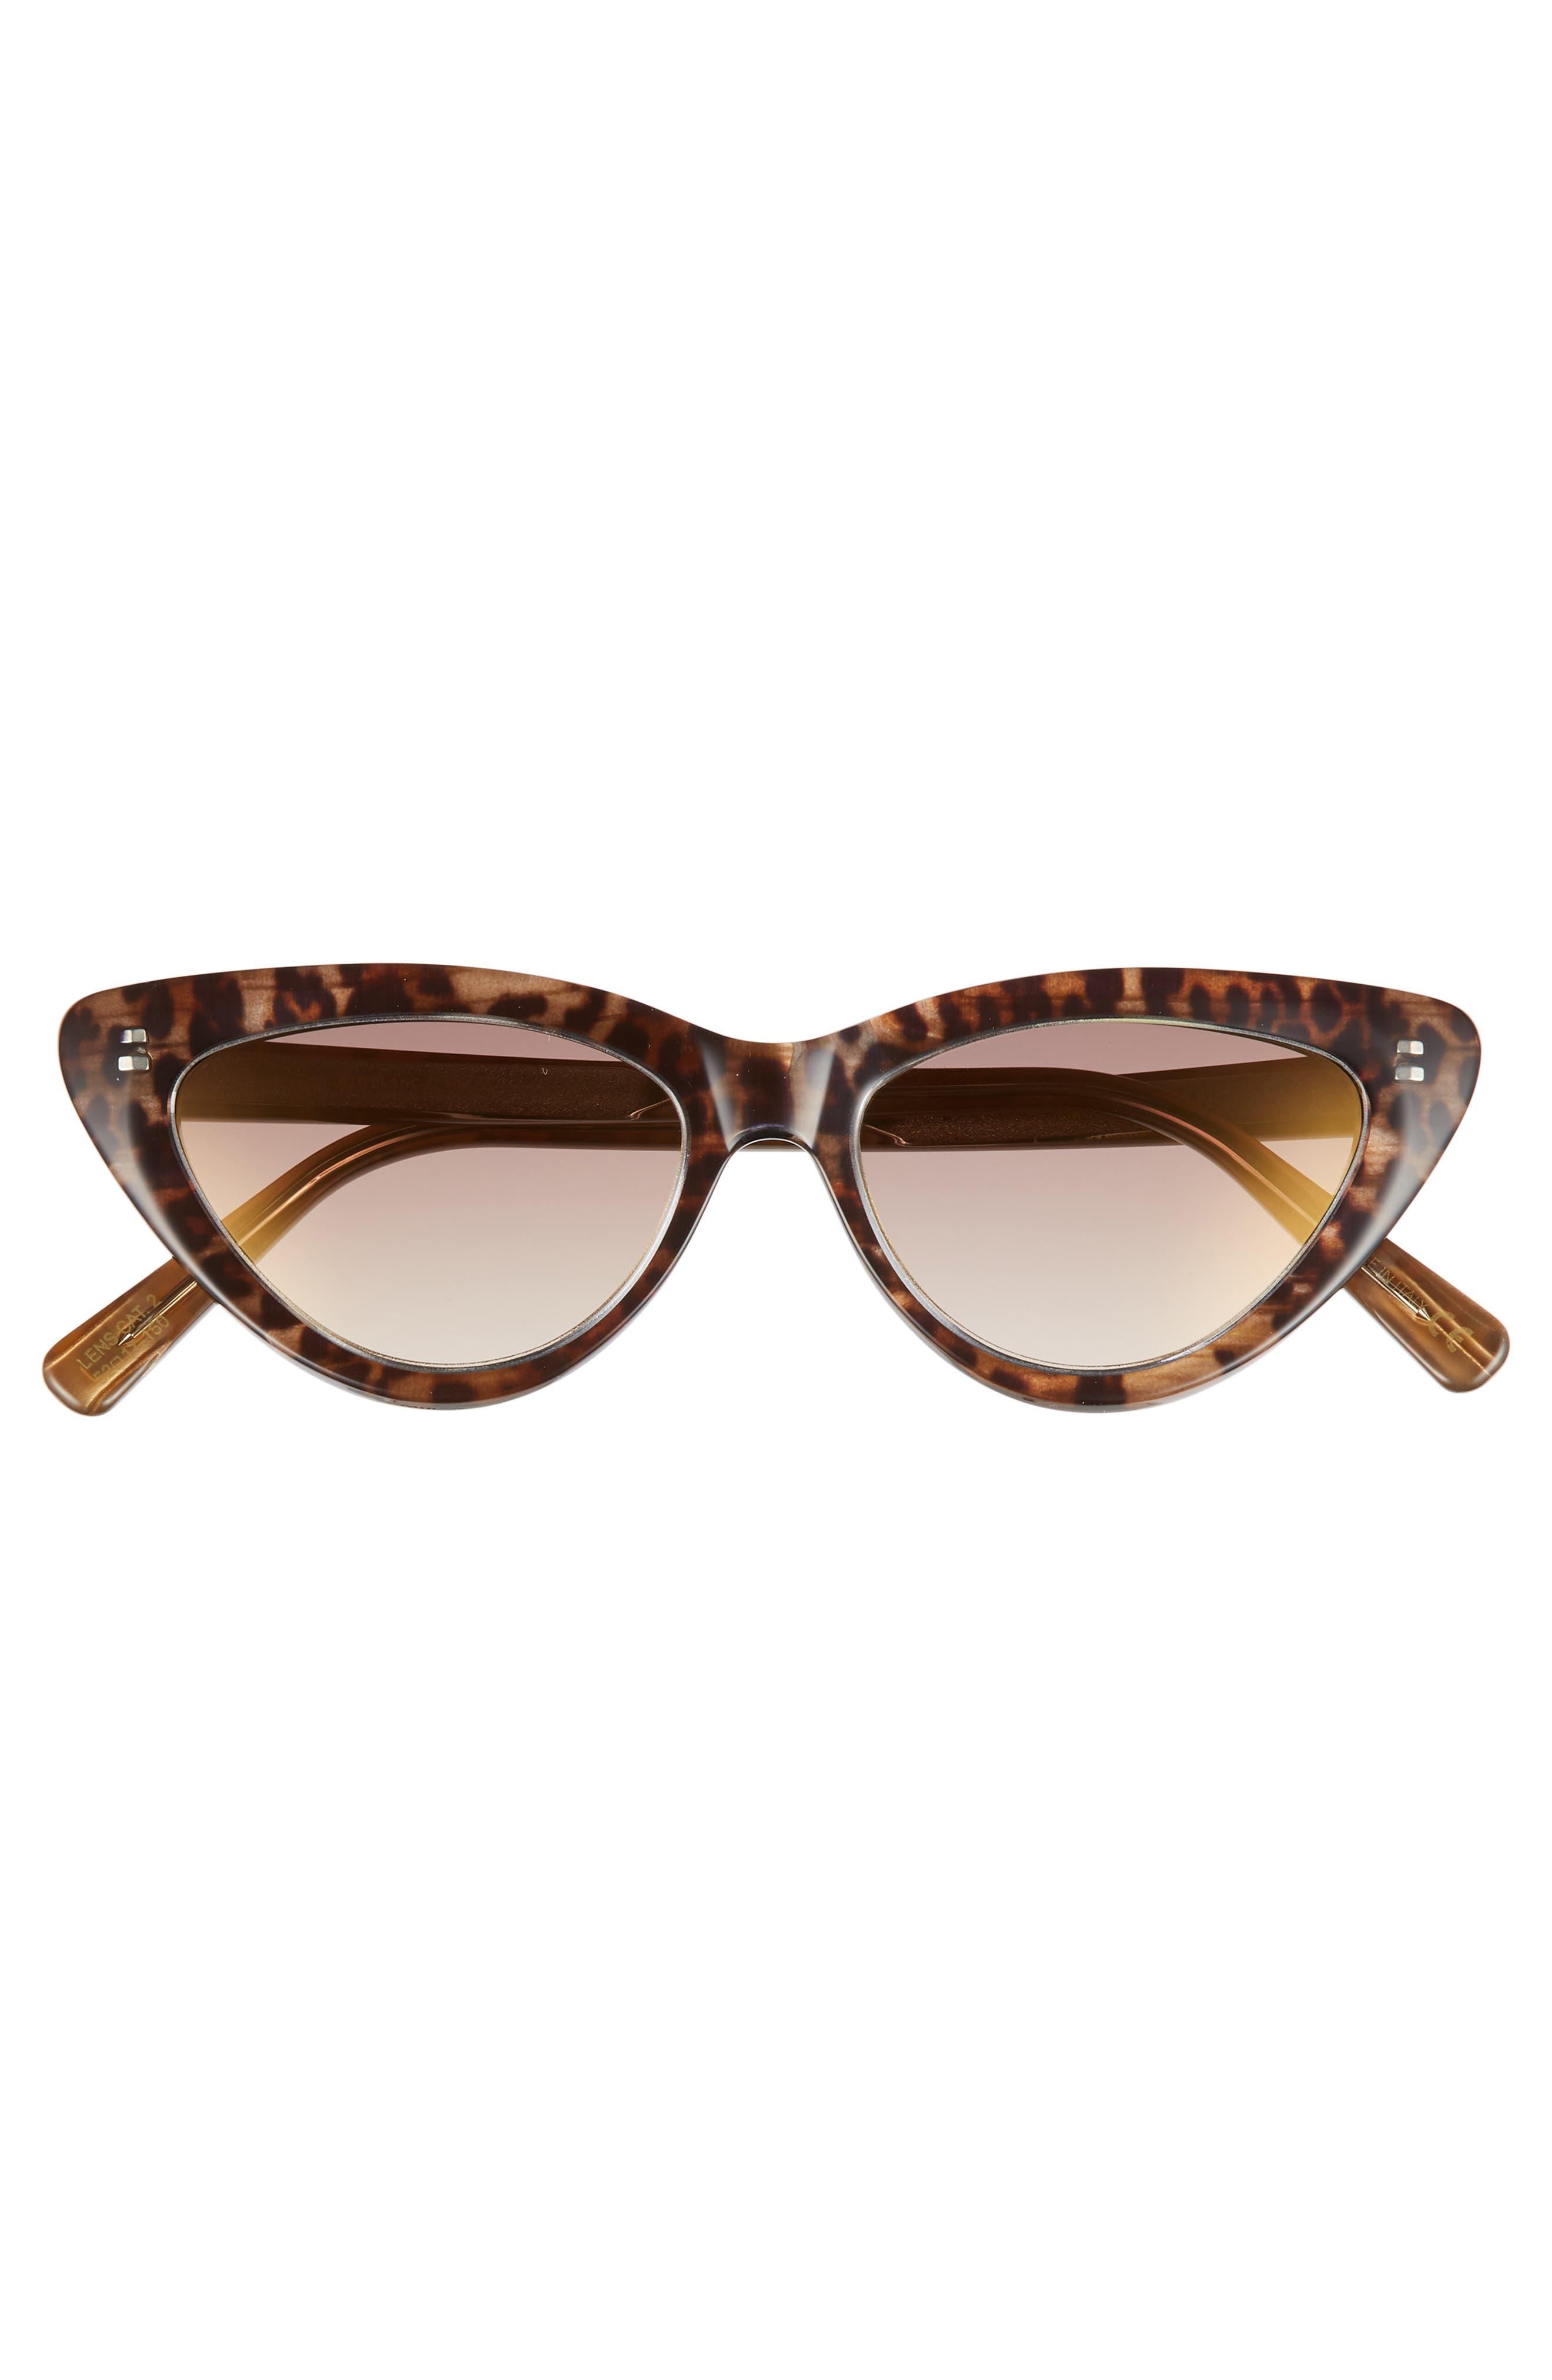 D'BLANC A-Muse 52mm Sunglasses,                             Alternate thumbnail 3, color,                             Cheetah